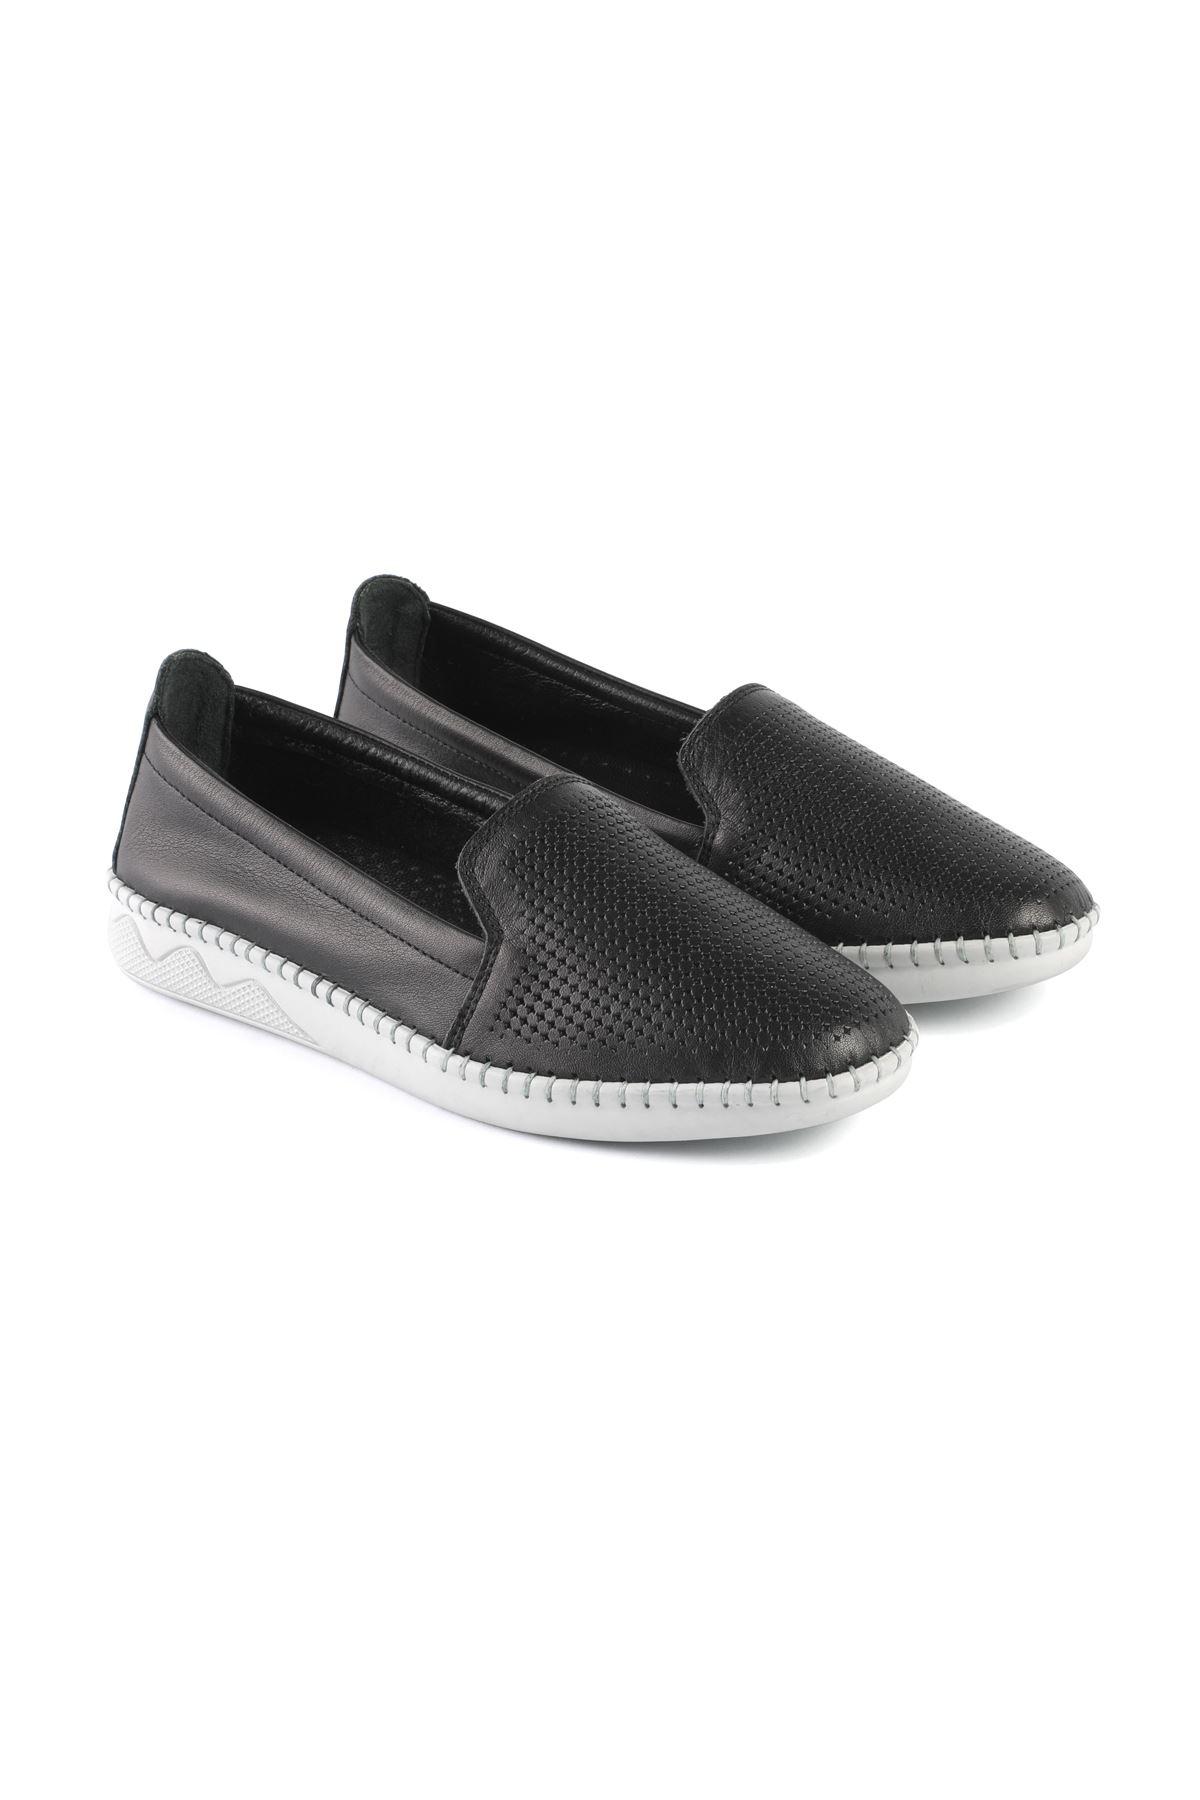 Libero FMS239 Black Babette Shoes